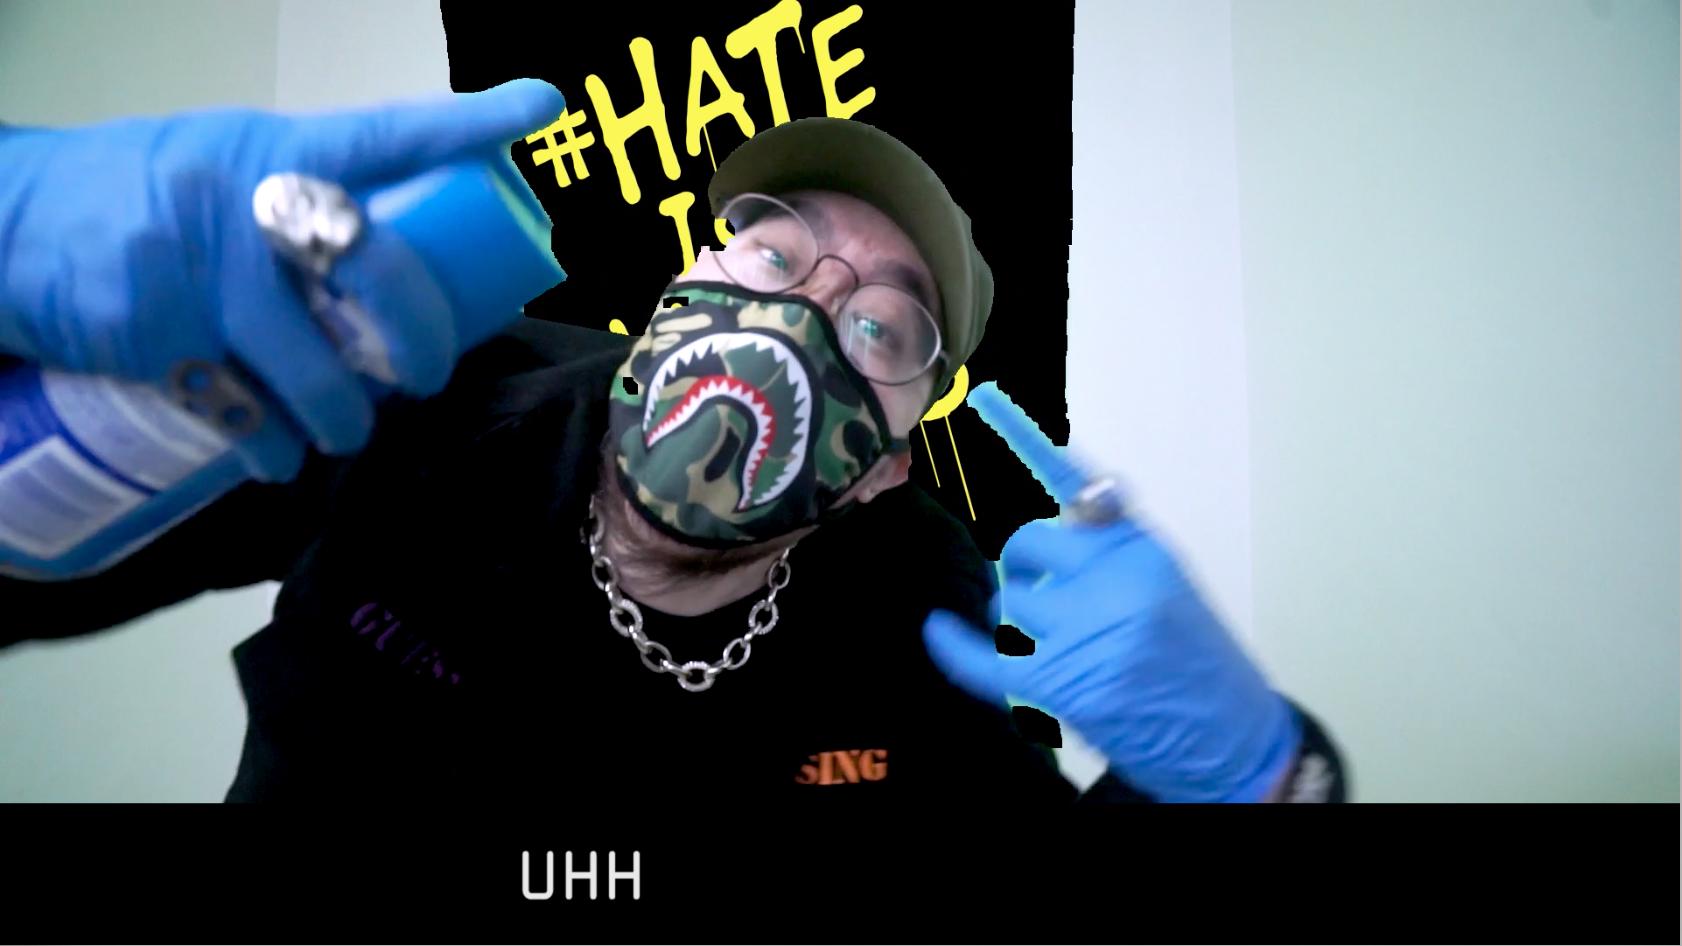 UHH OOOH! (No Hate)